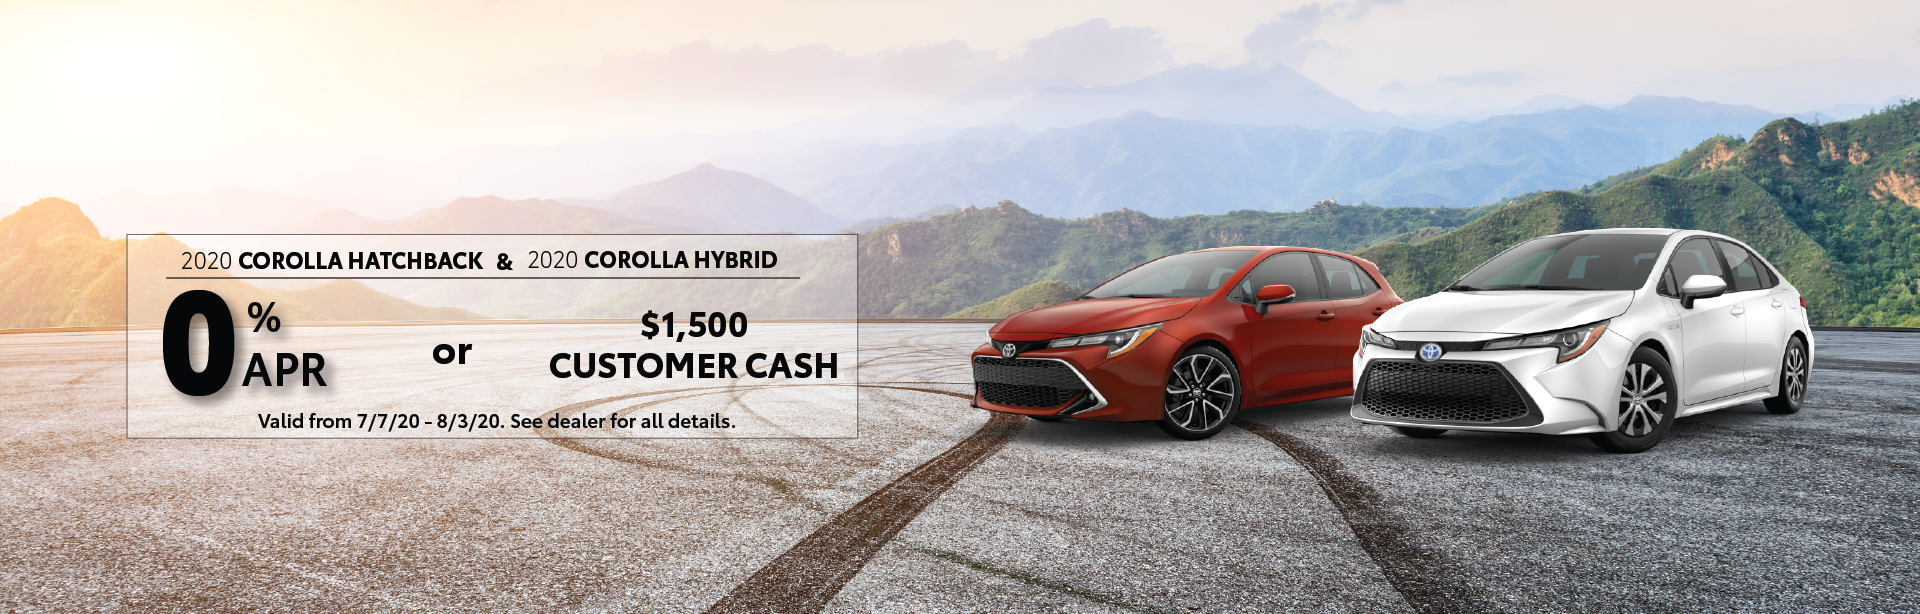 Toyota Corolla Hatchback and Corolla Hybrid Offer